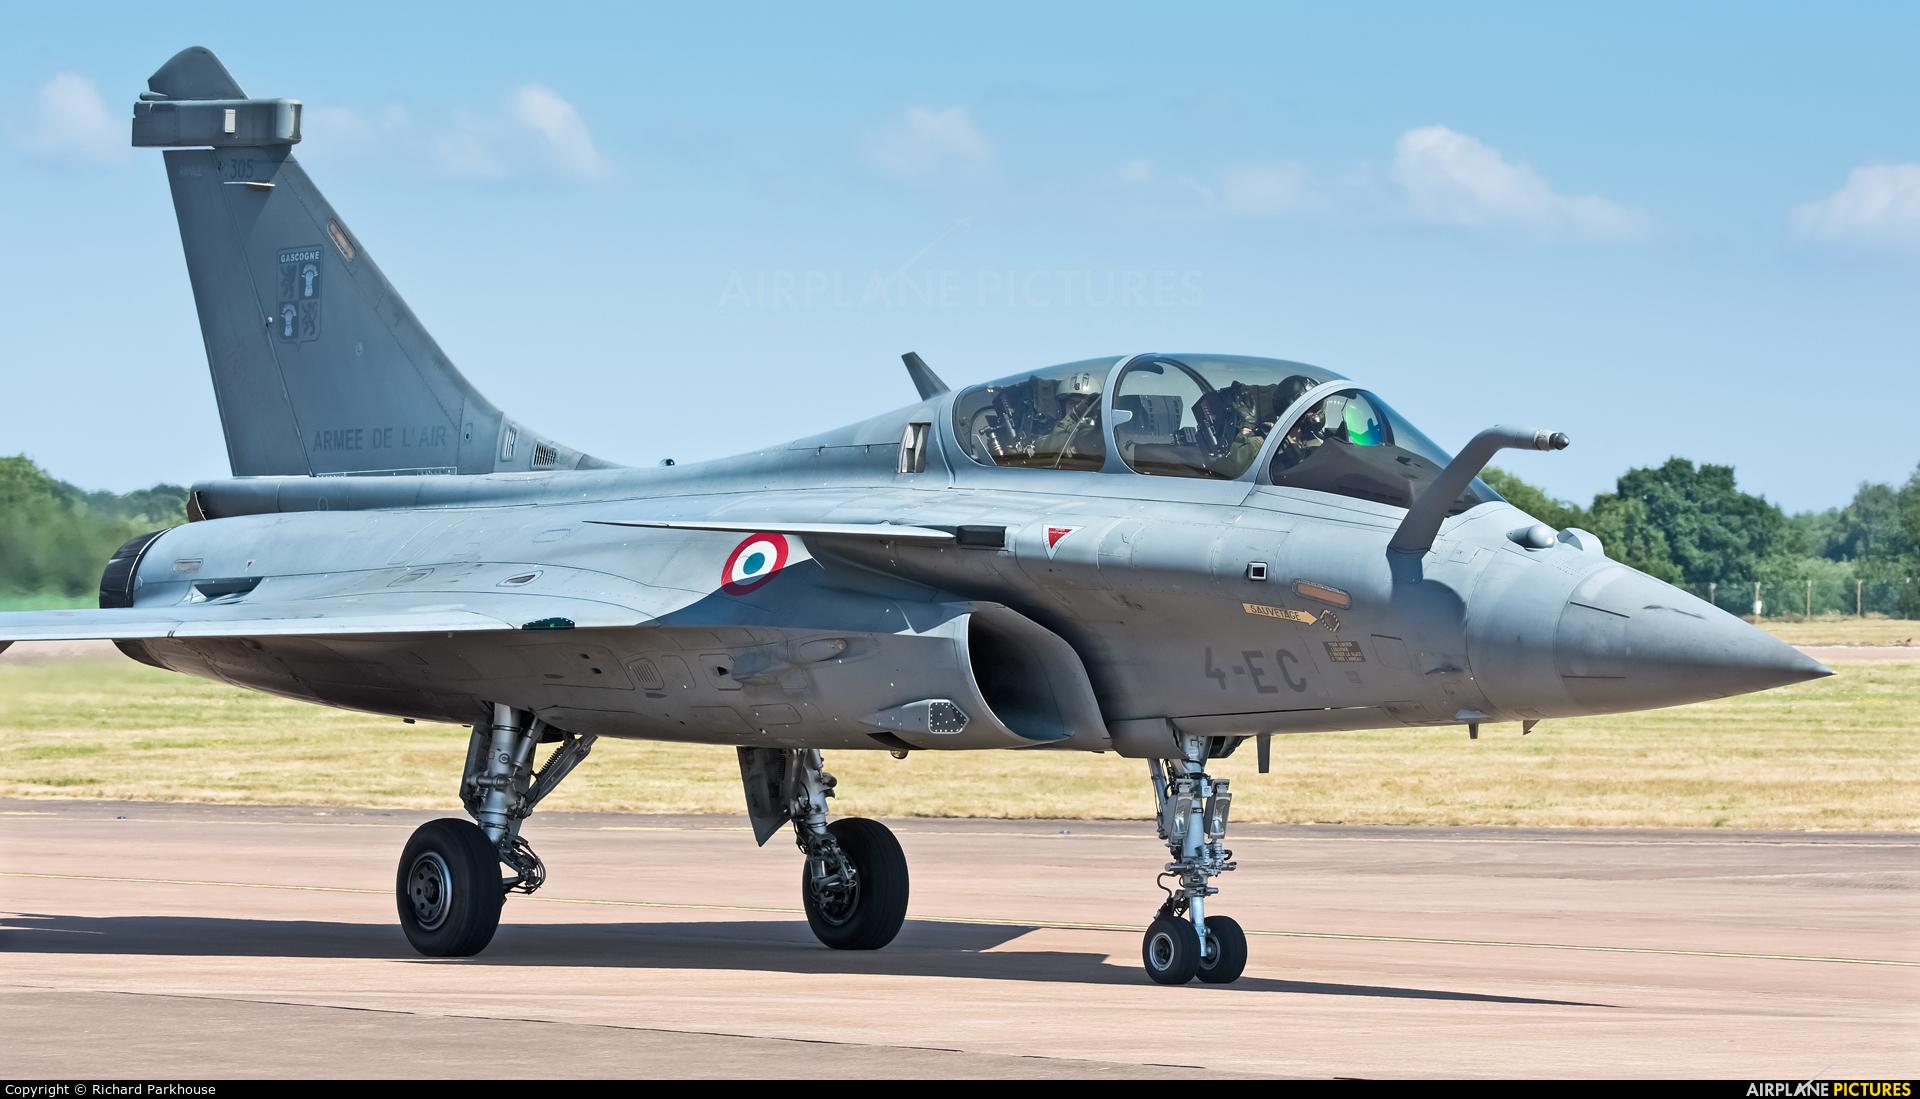 France - Air Force 305 aircraft at Fairford